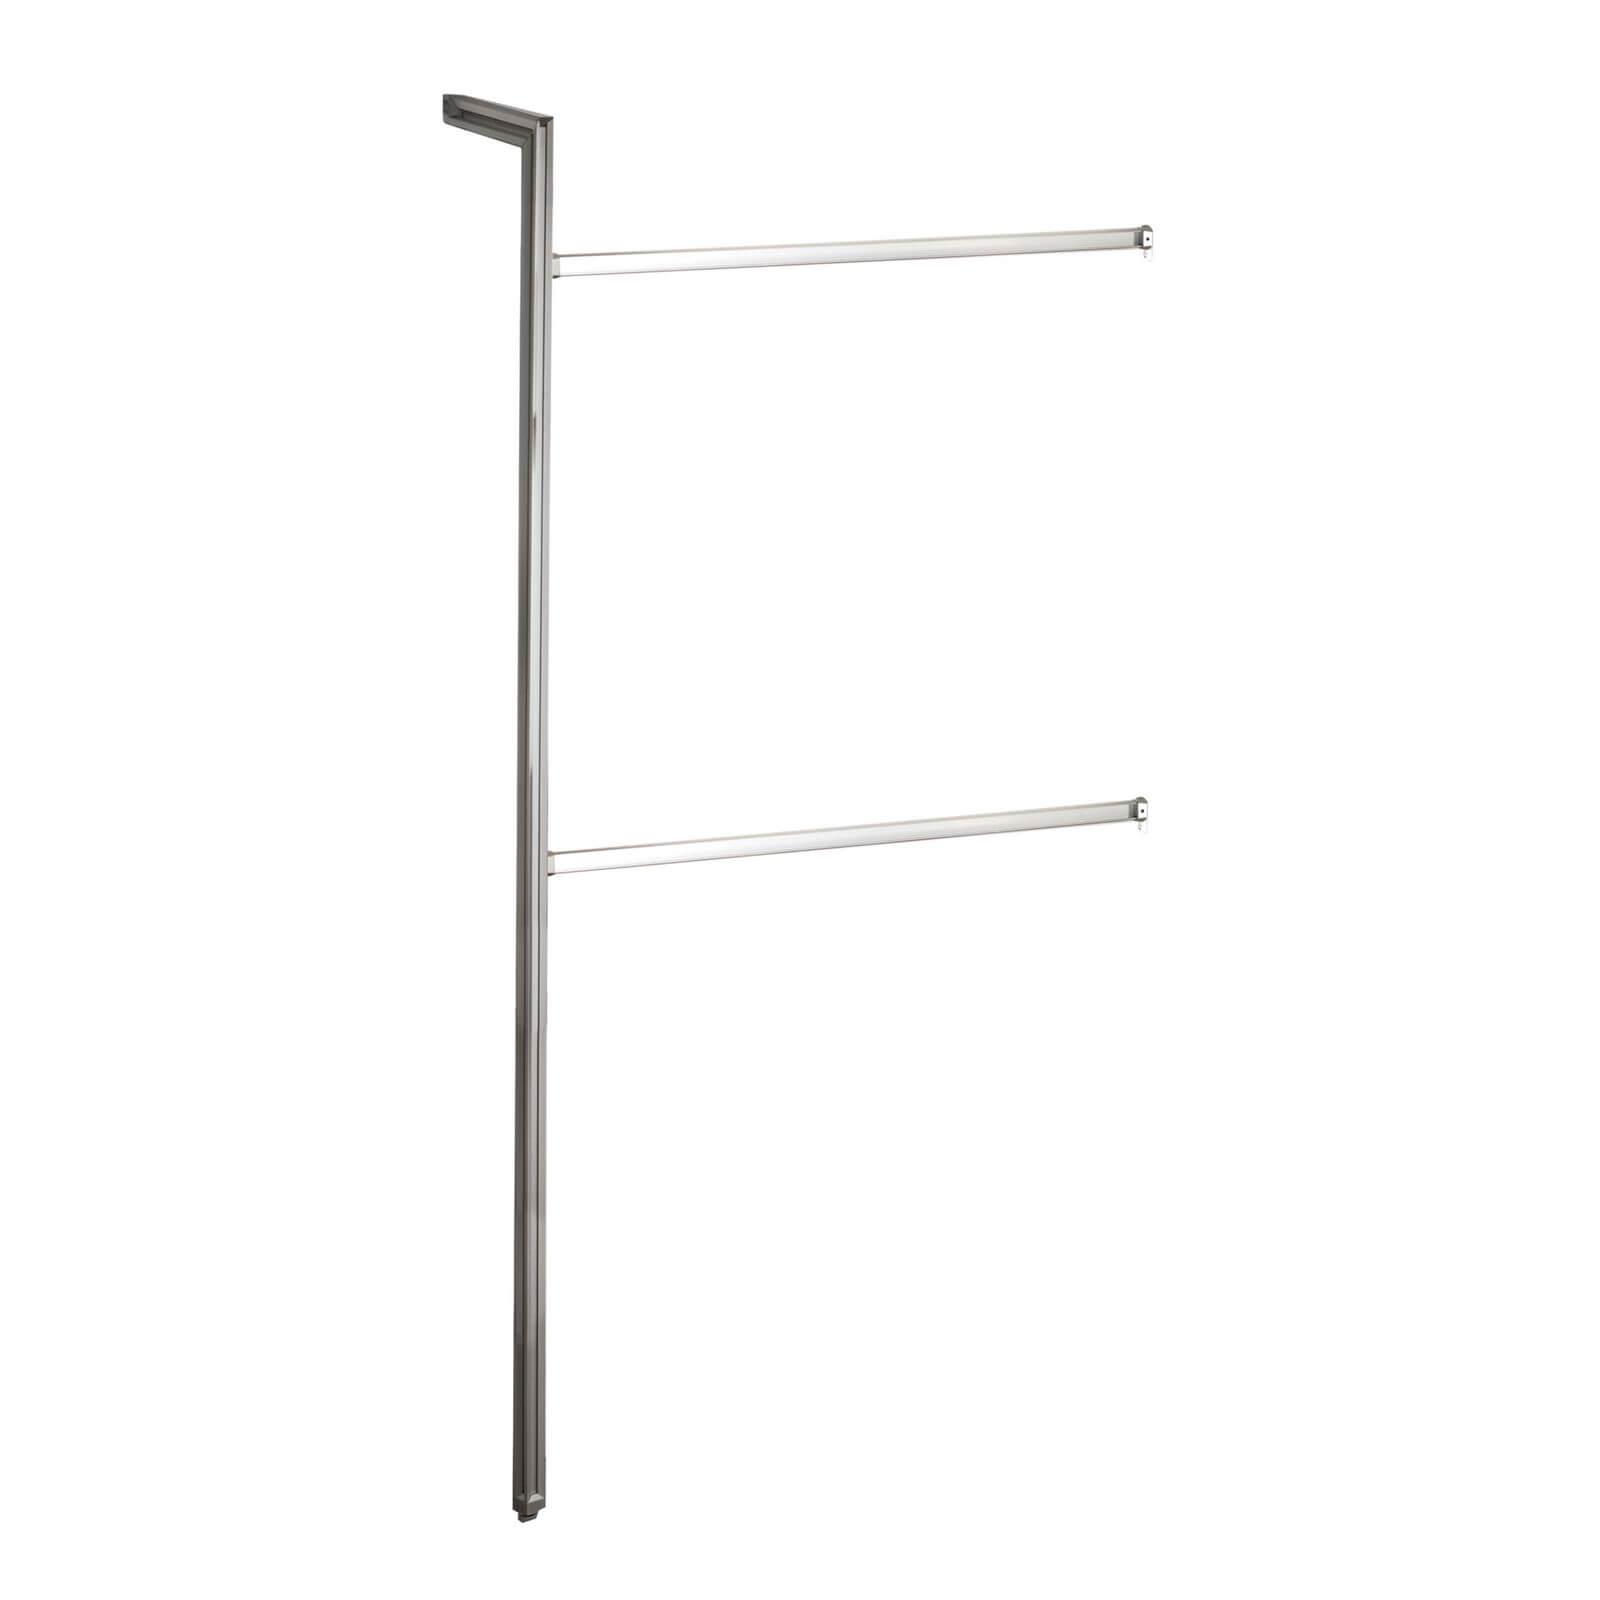 Relax Wardrobe Storage Bedroom Bundle 1 with Extendable Hangers